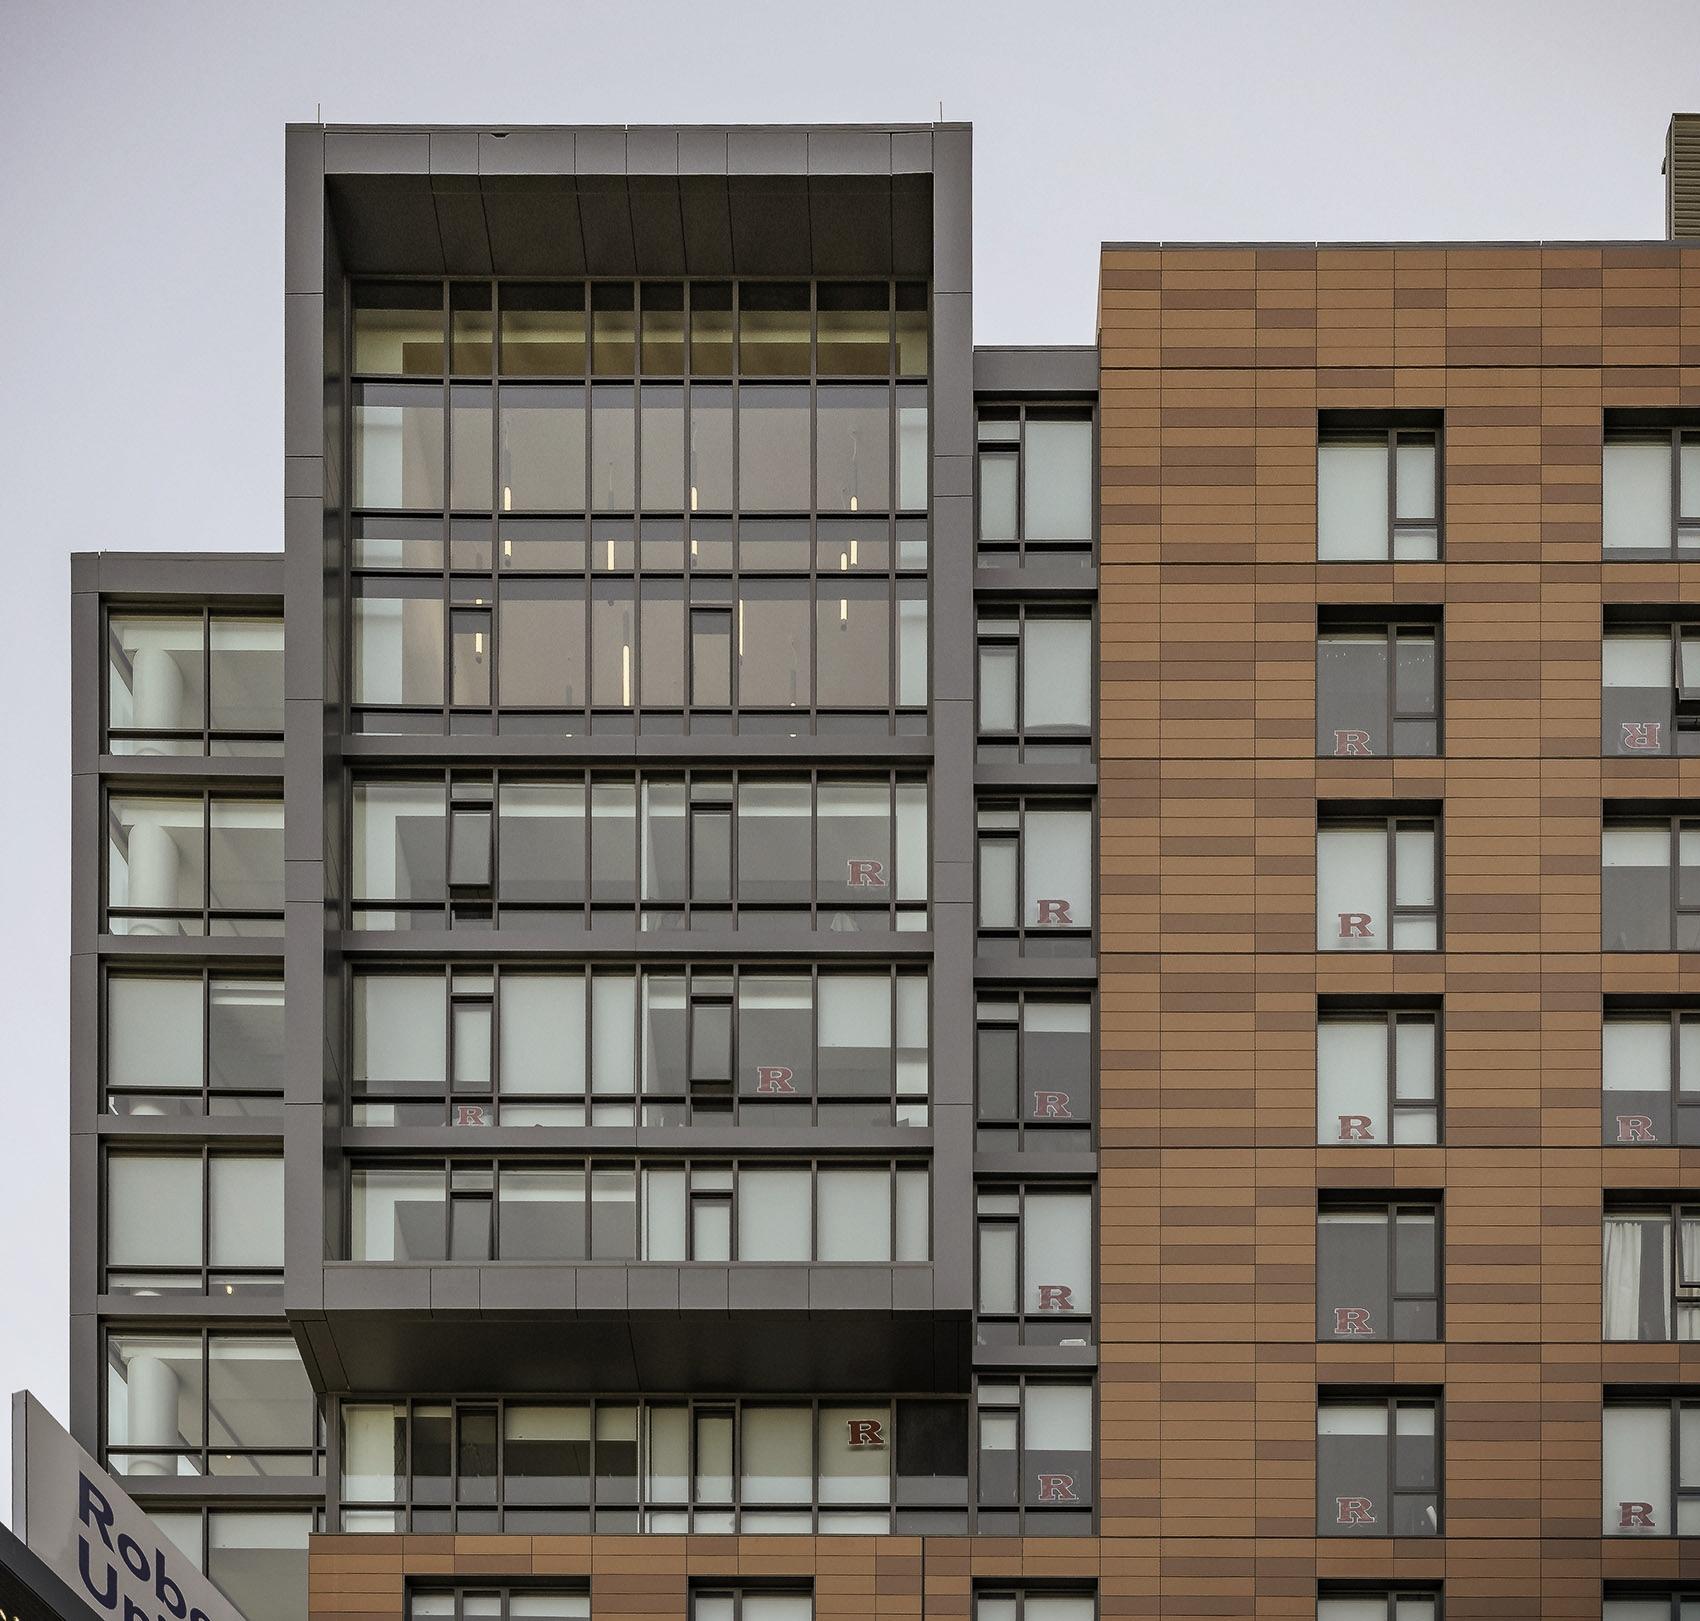 Rutgers University Apartments